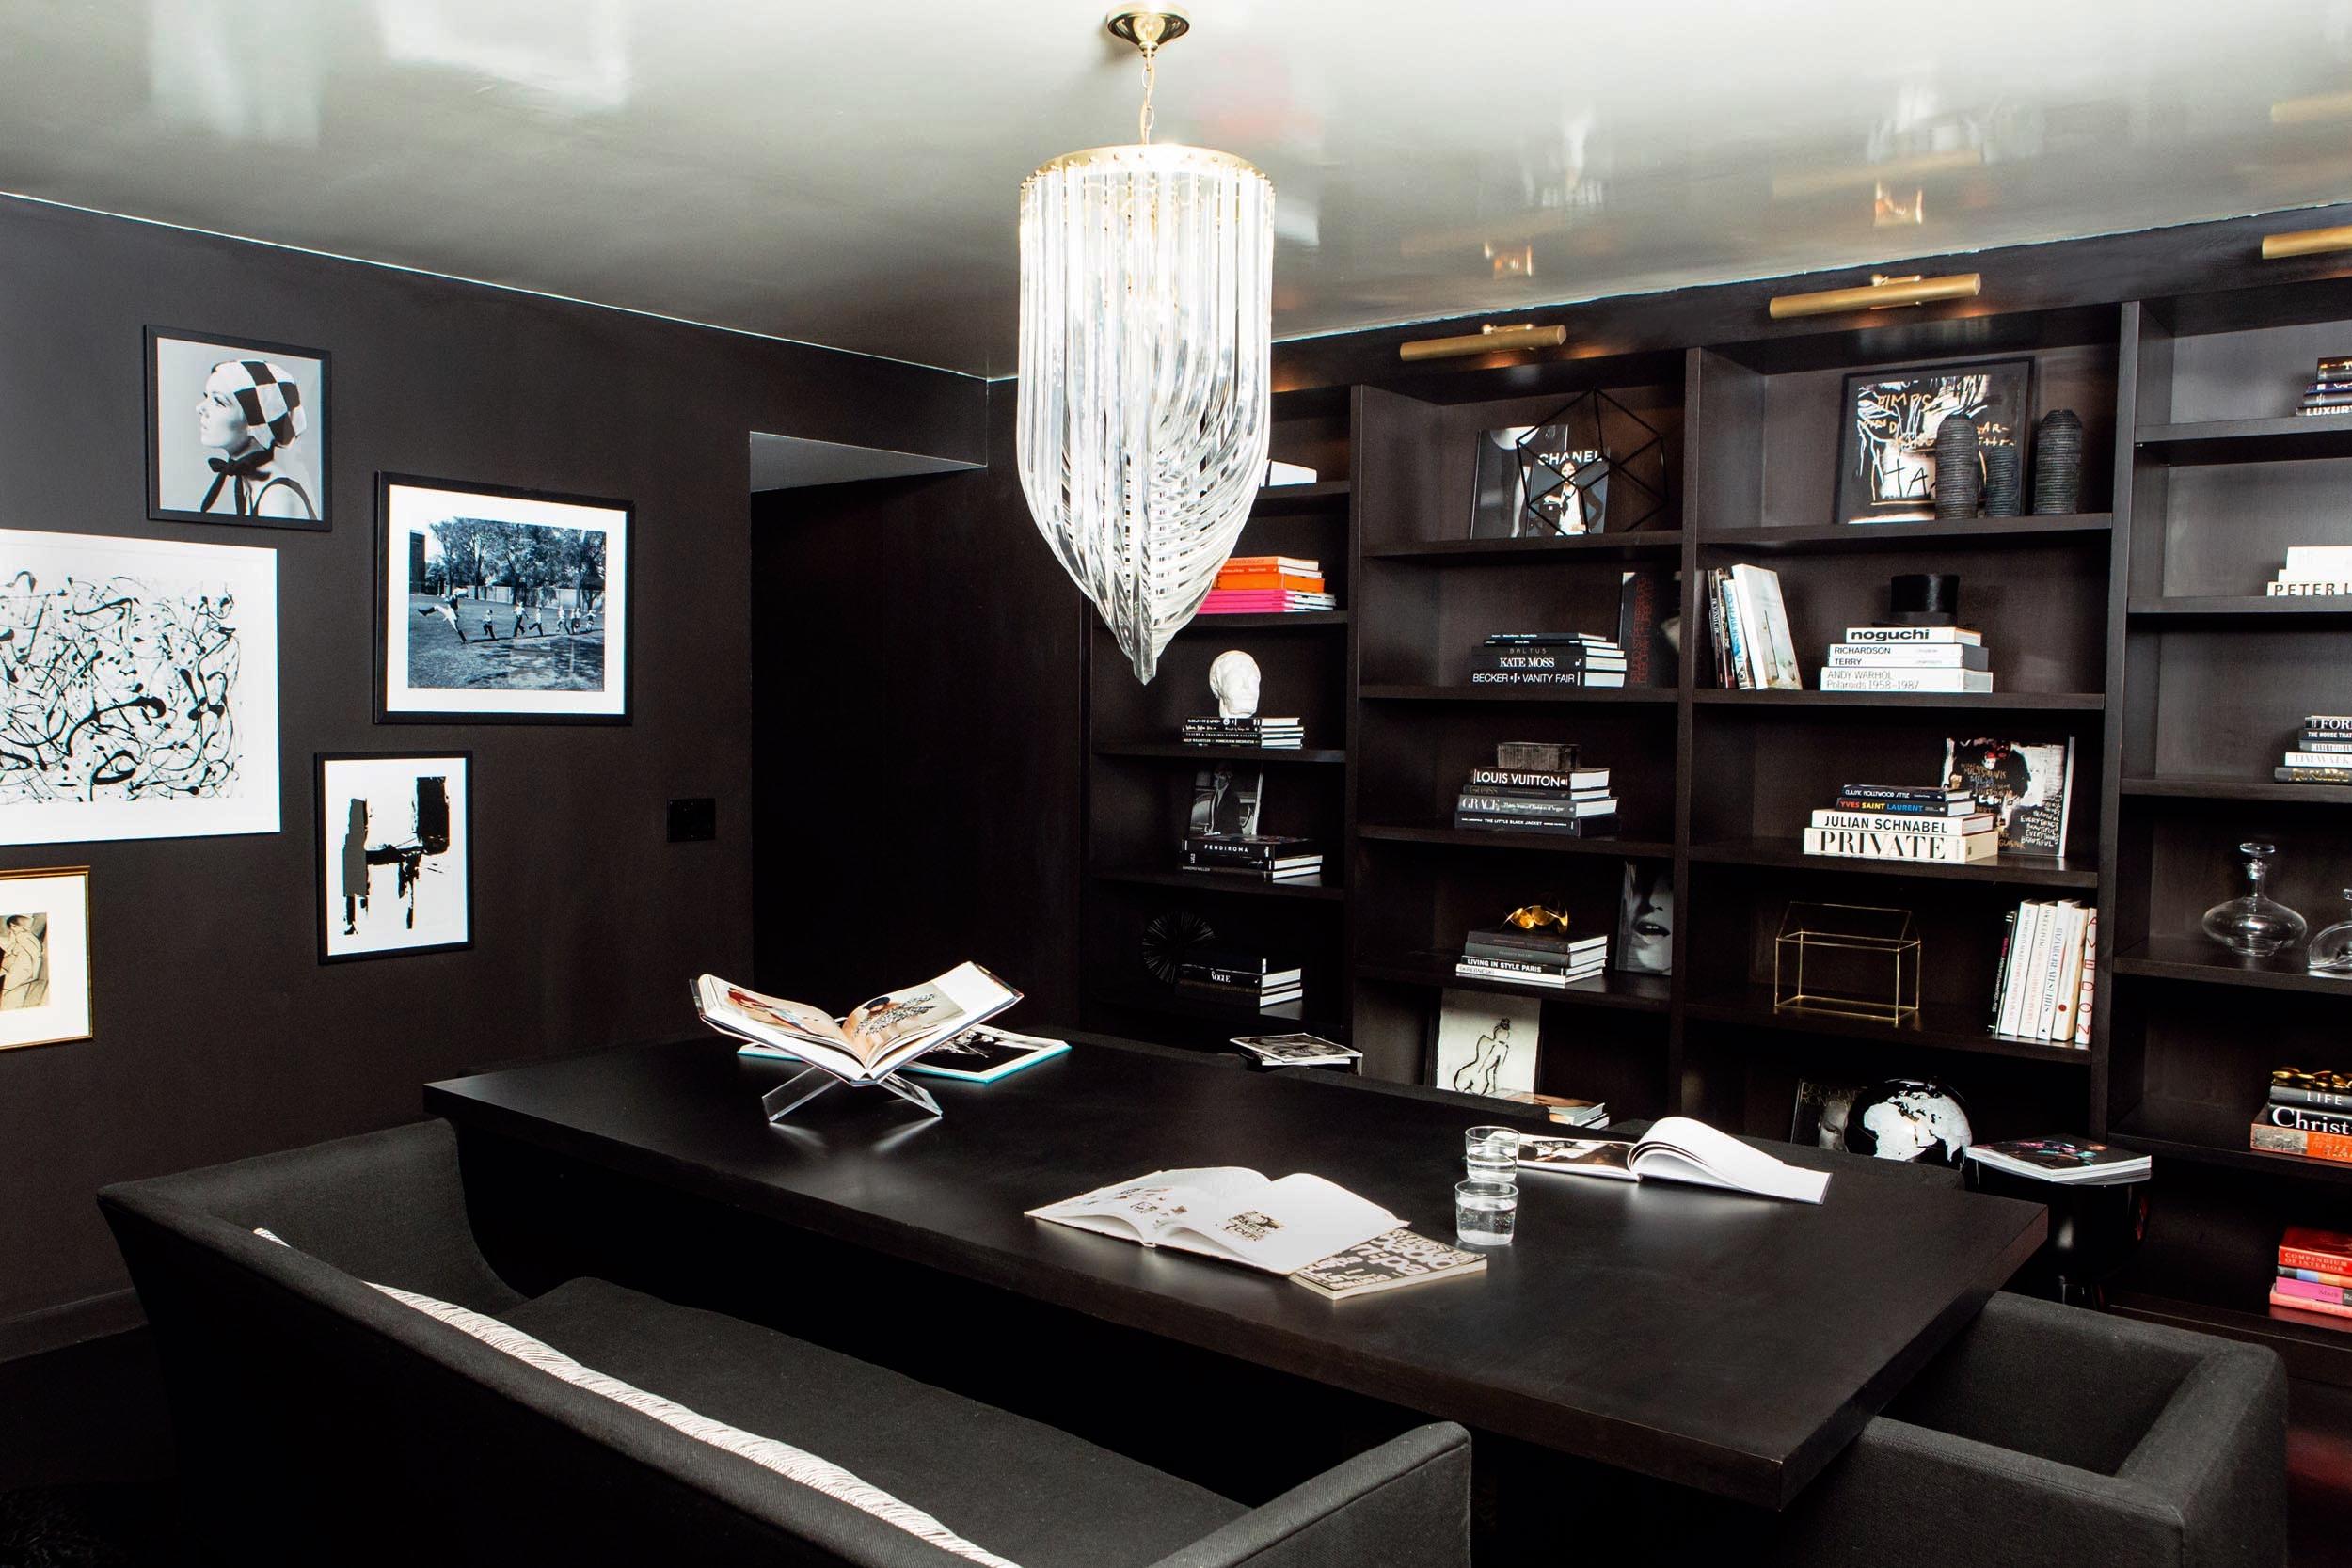 Leo_Designs_Chicago_interior_lake_shore_renovation26.jpg